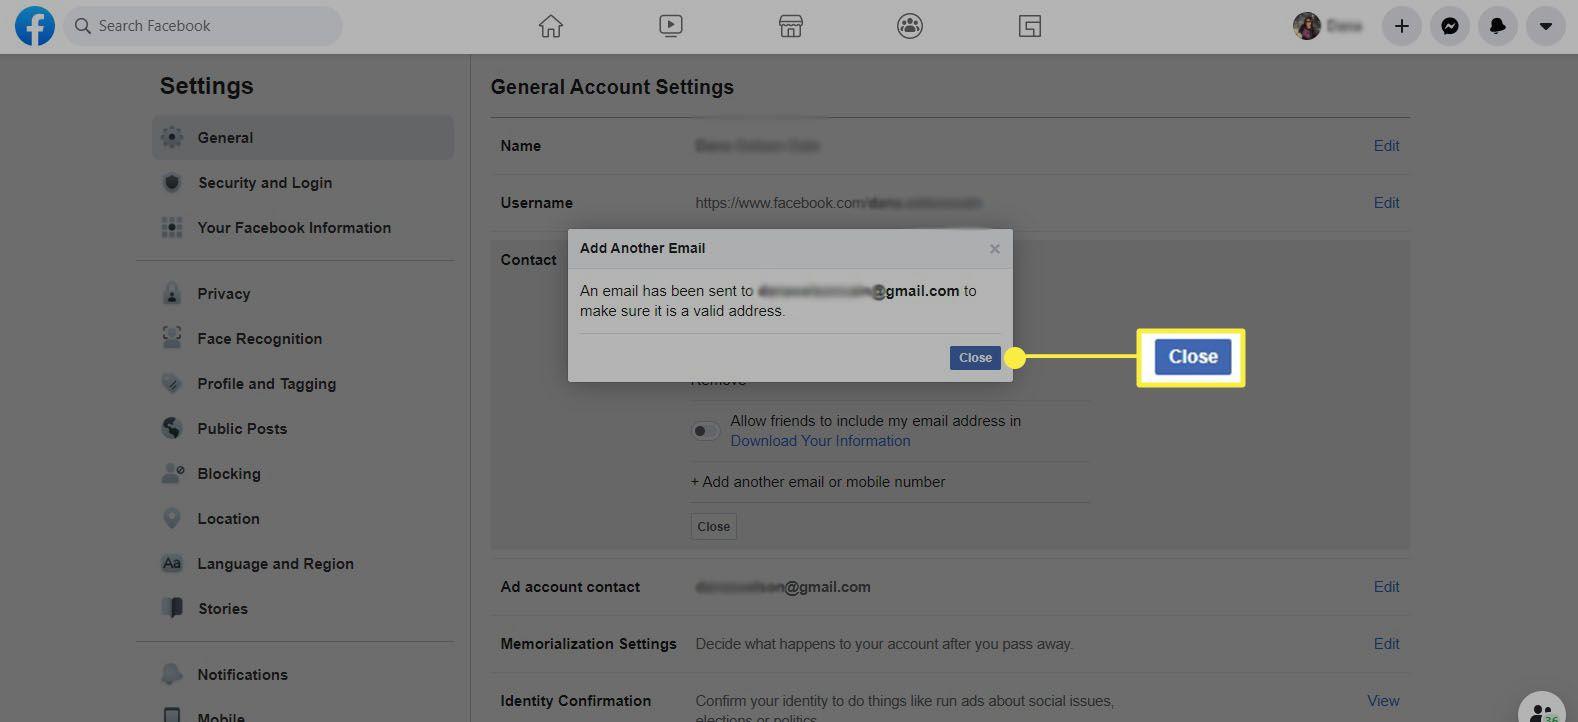 Facebook - select Close